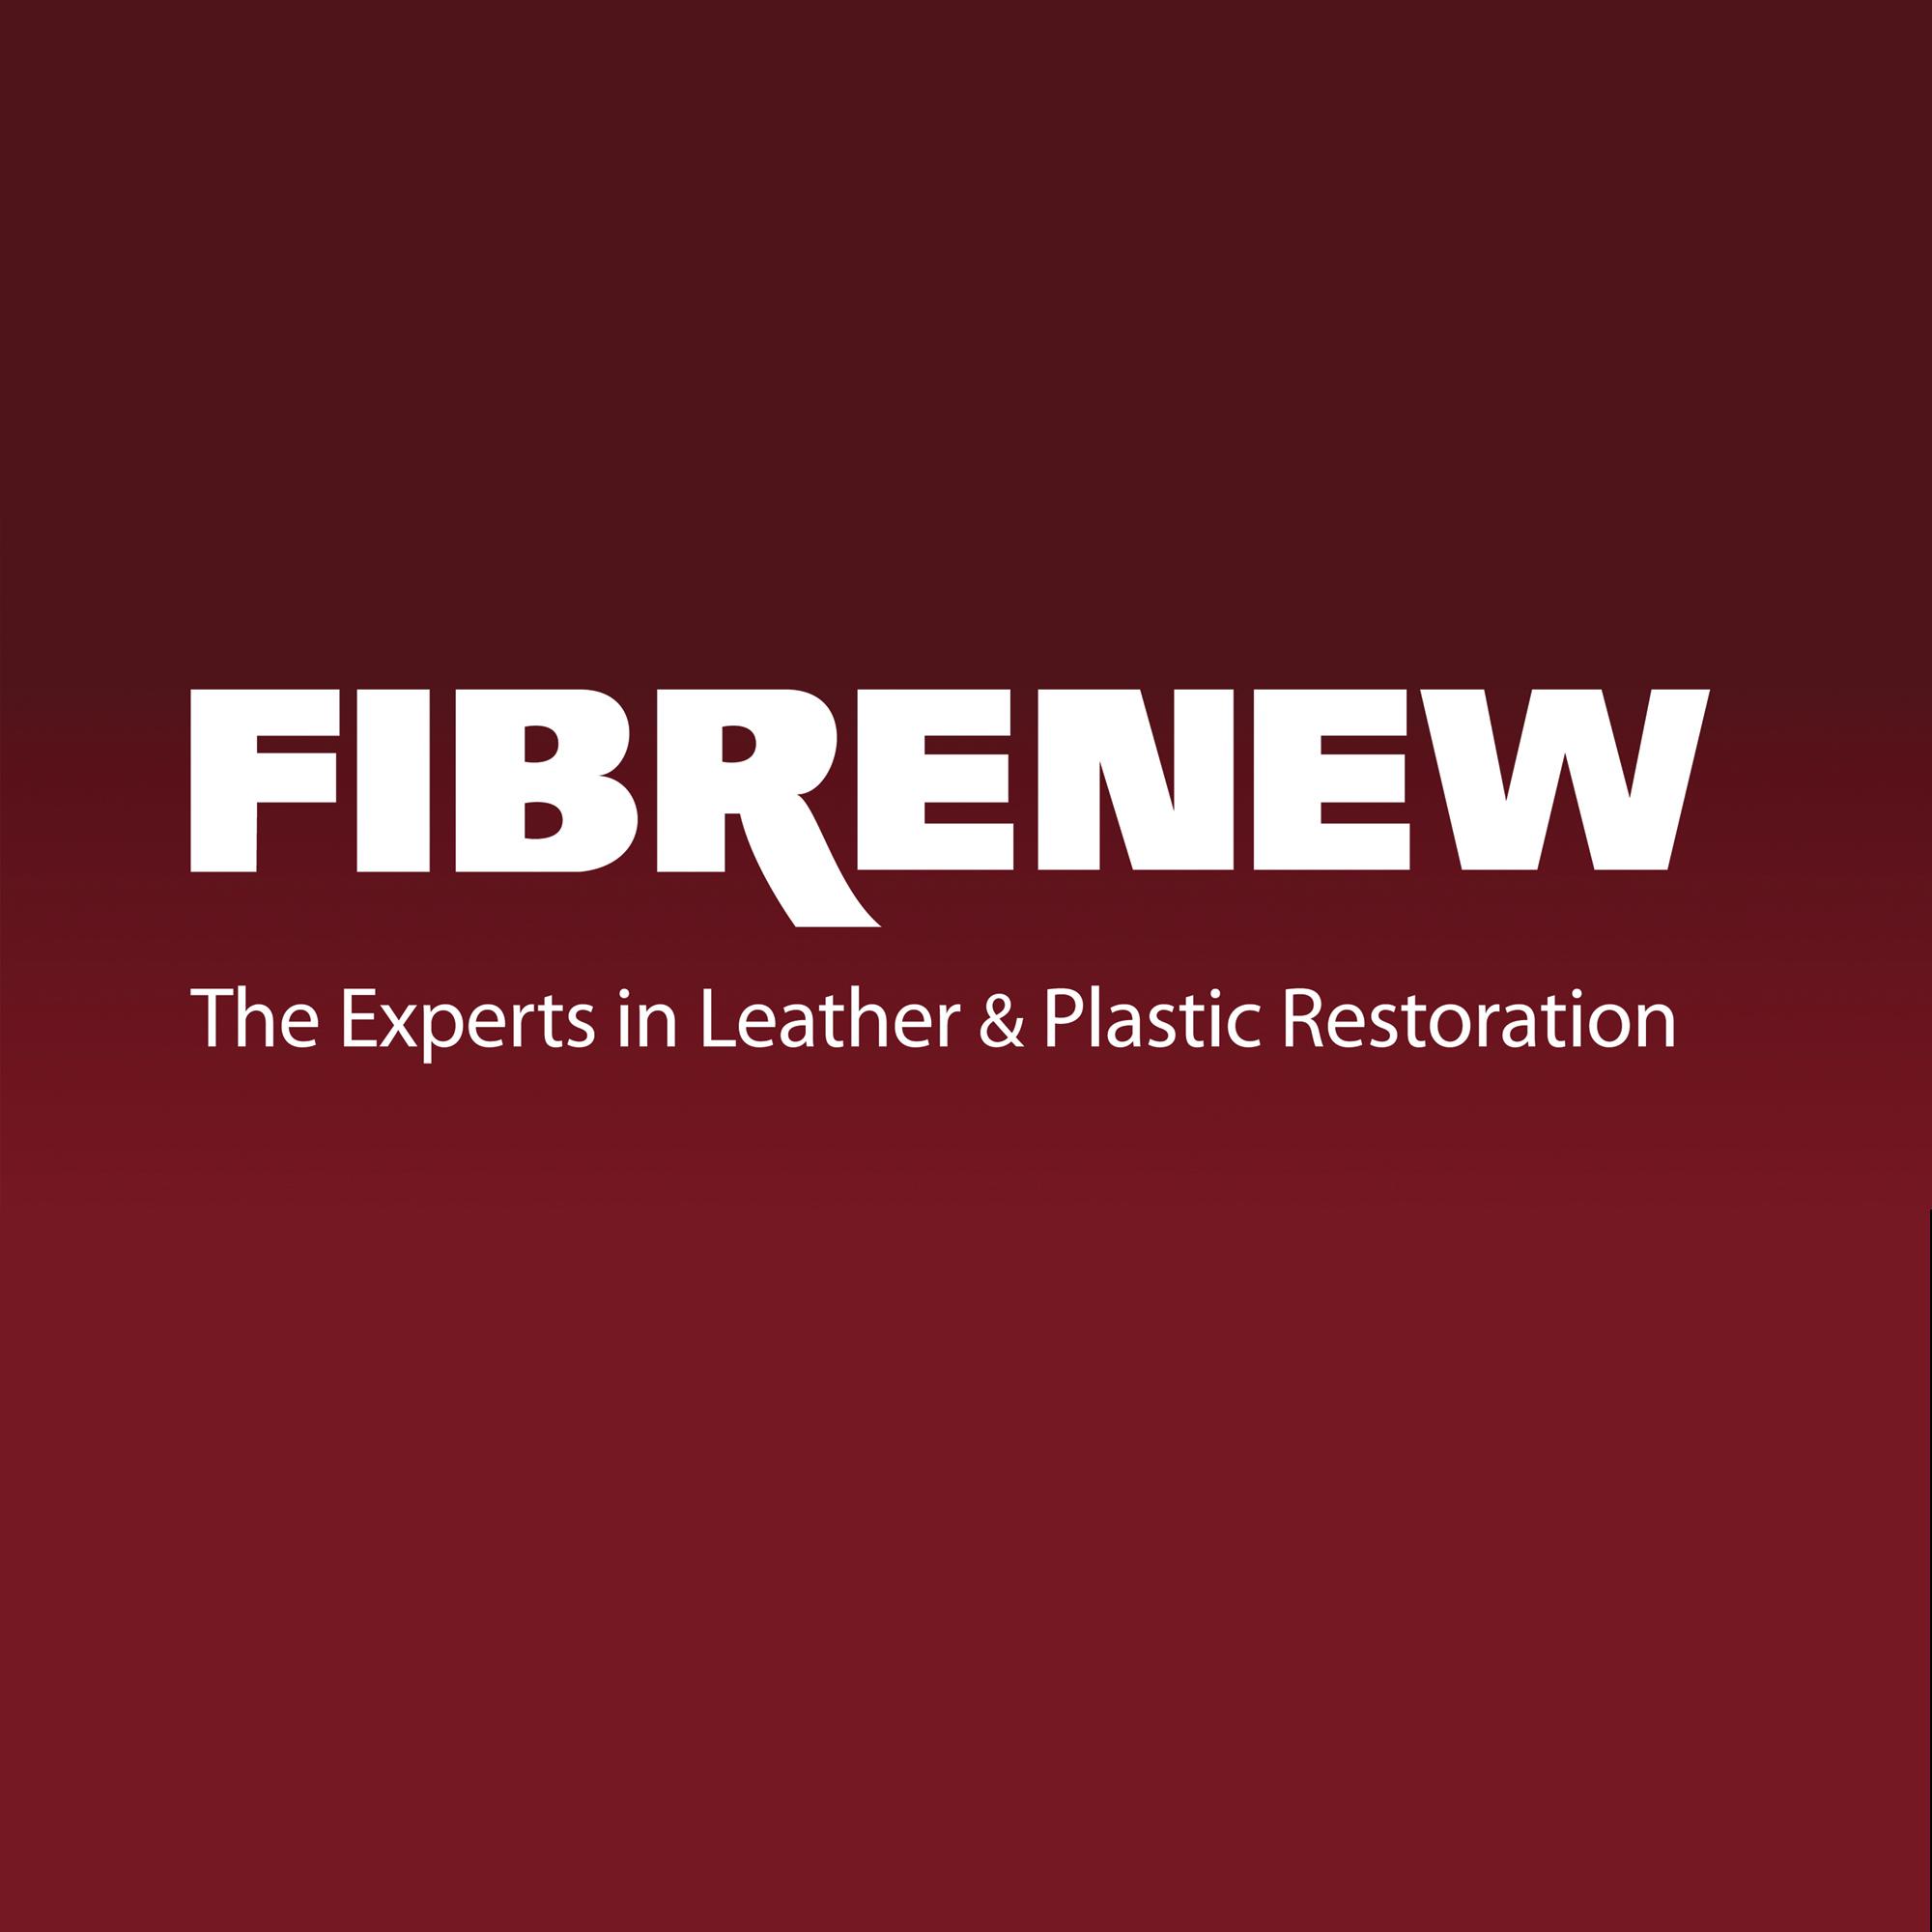 fibrenew franchise